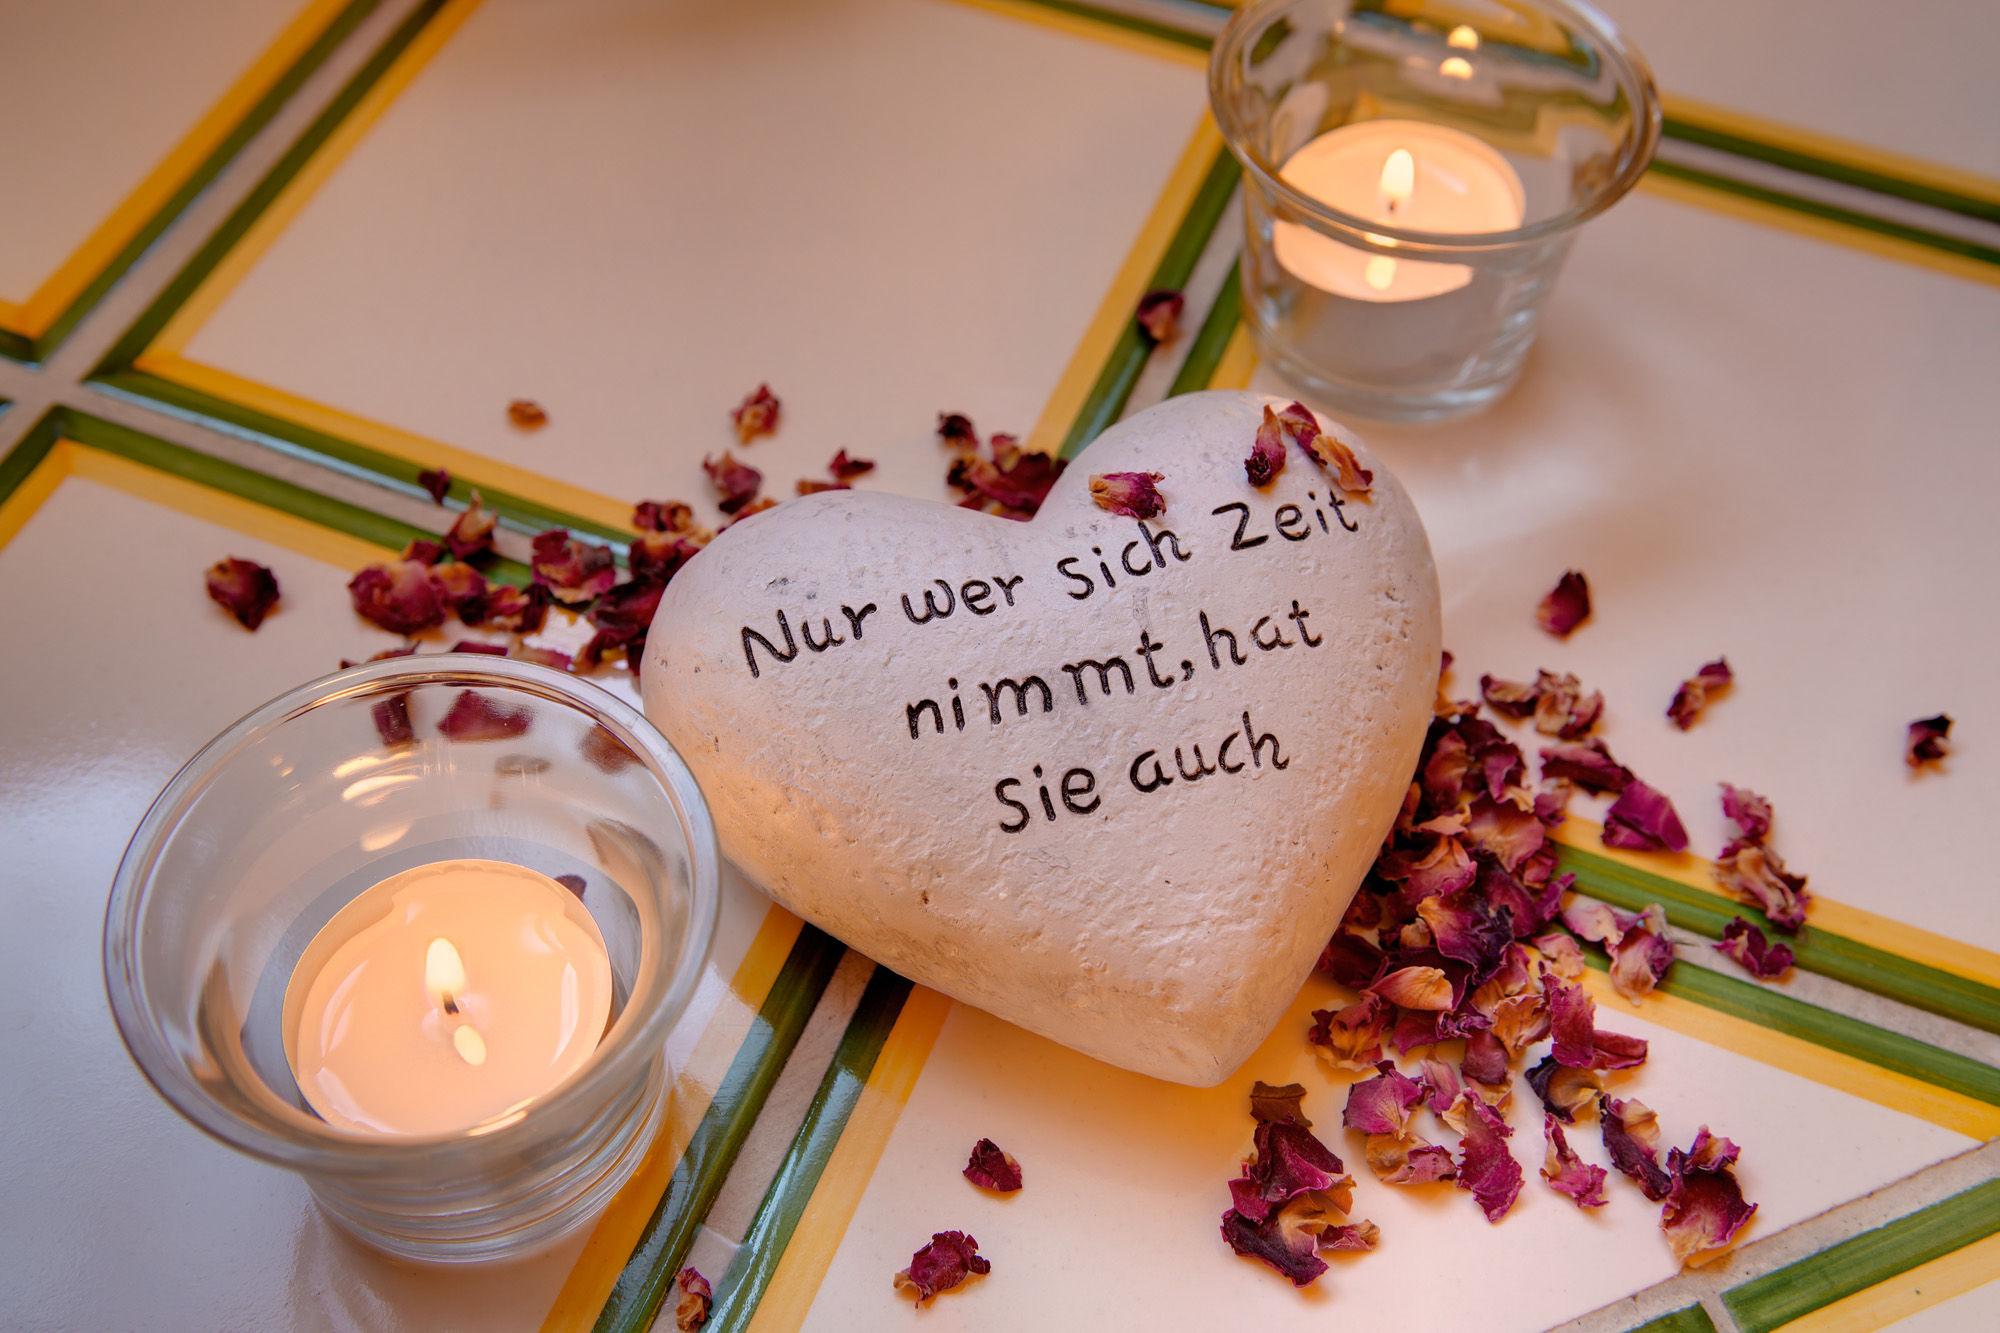 Wellness-Wochenende Brandenburg - Wellness Spreewald - Urlaub im Schloss - Schloss Lübbenau im Spreewald